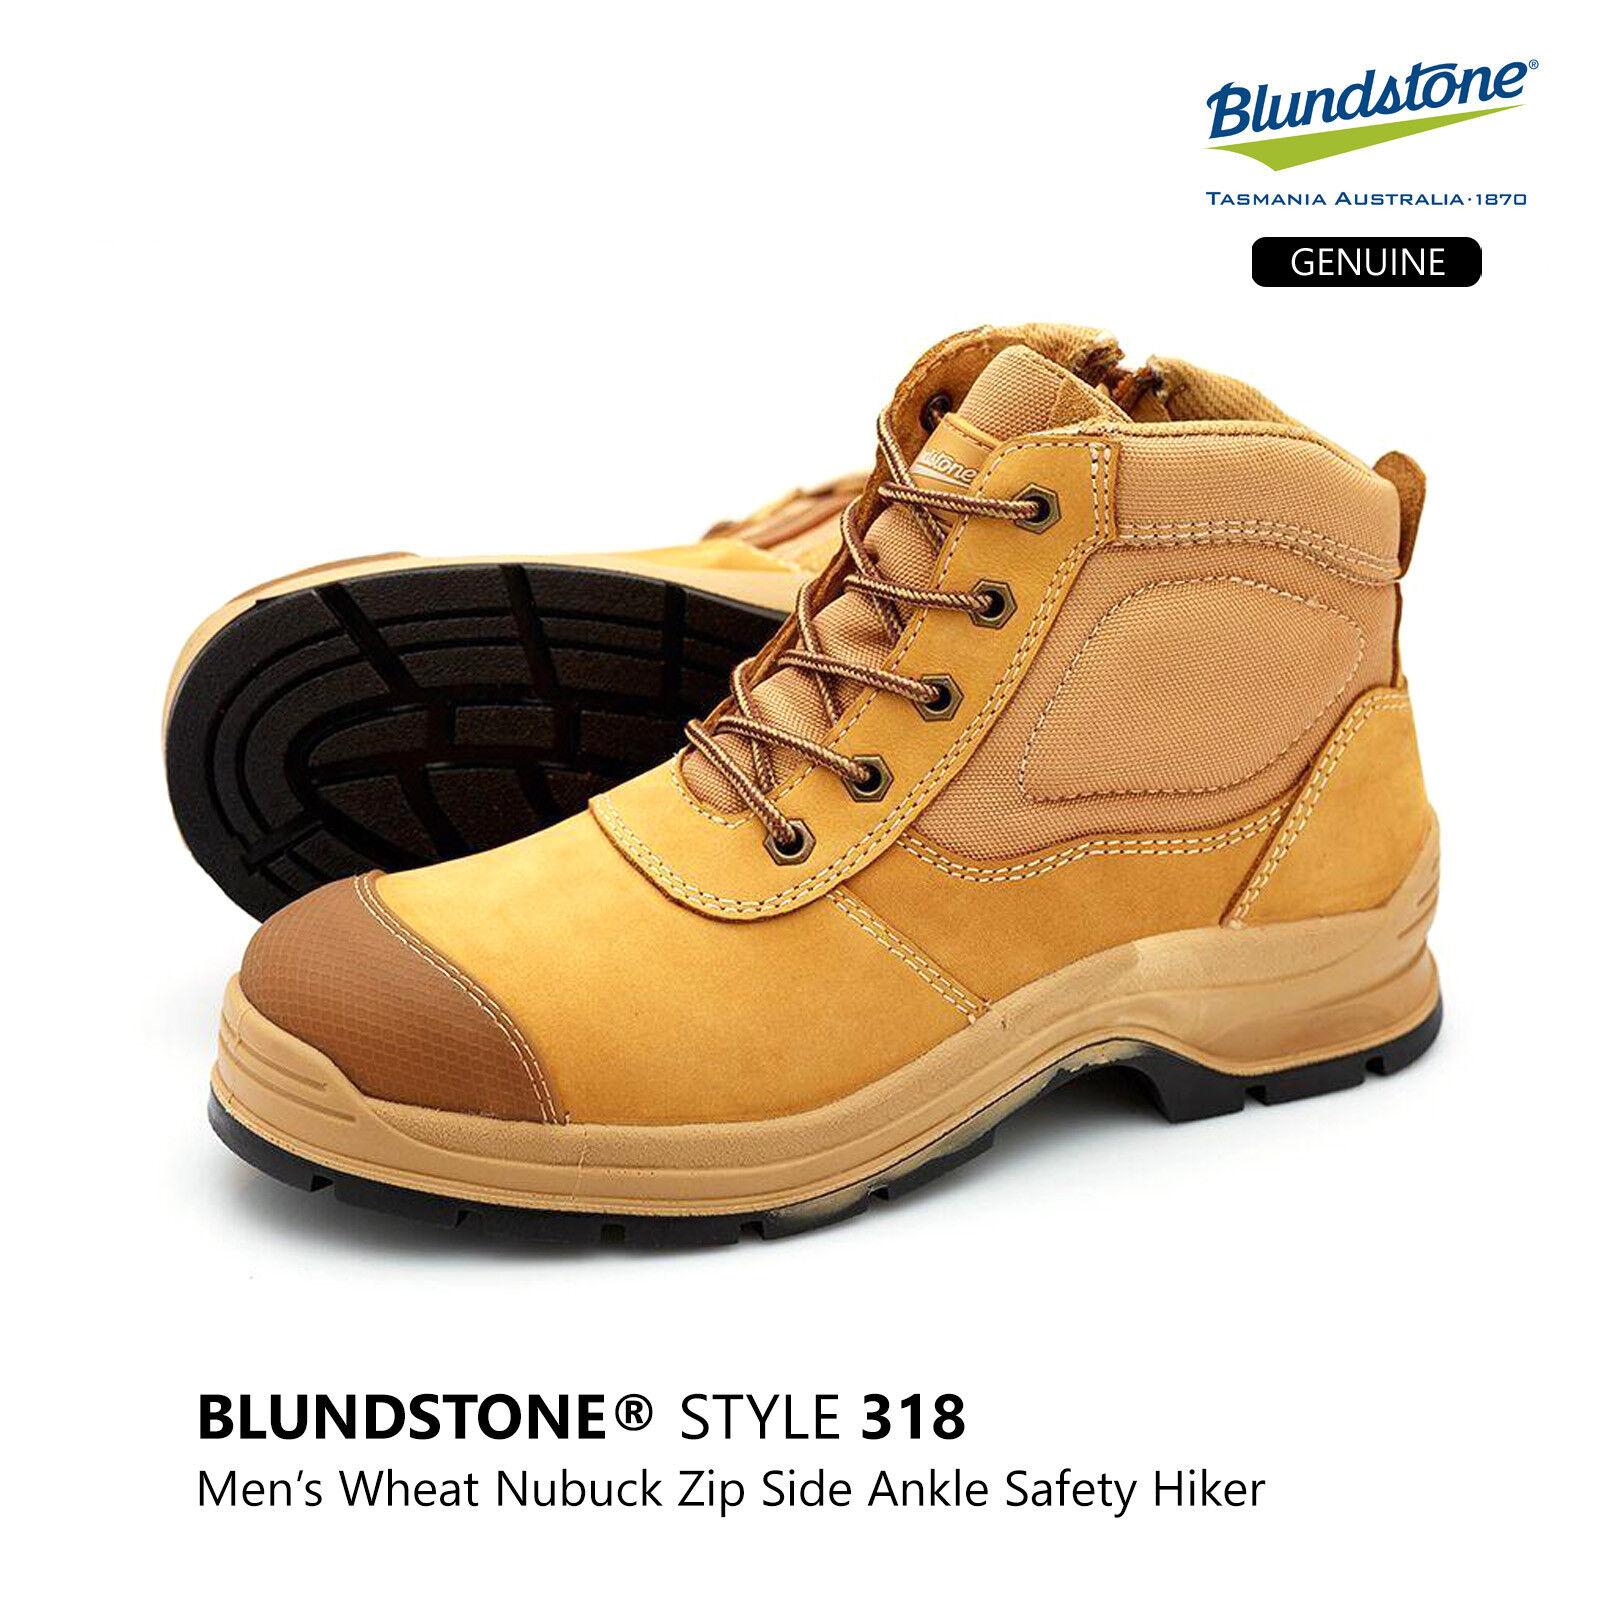 azulndstone 318 Wheat Nubuck Leather Steel Cap Side Zip Safety Hiker bota